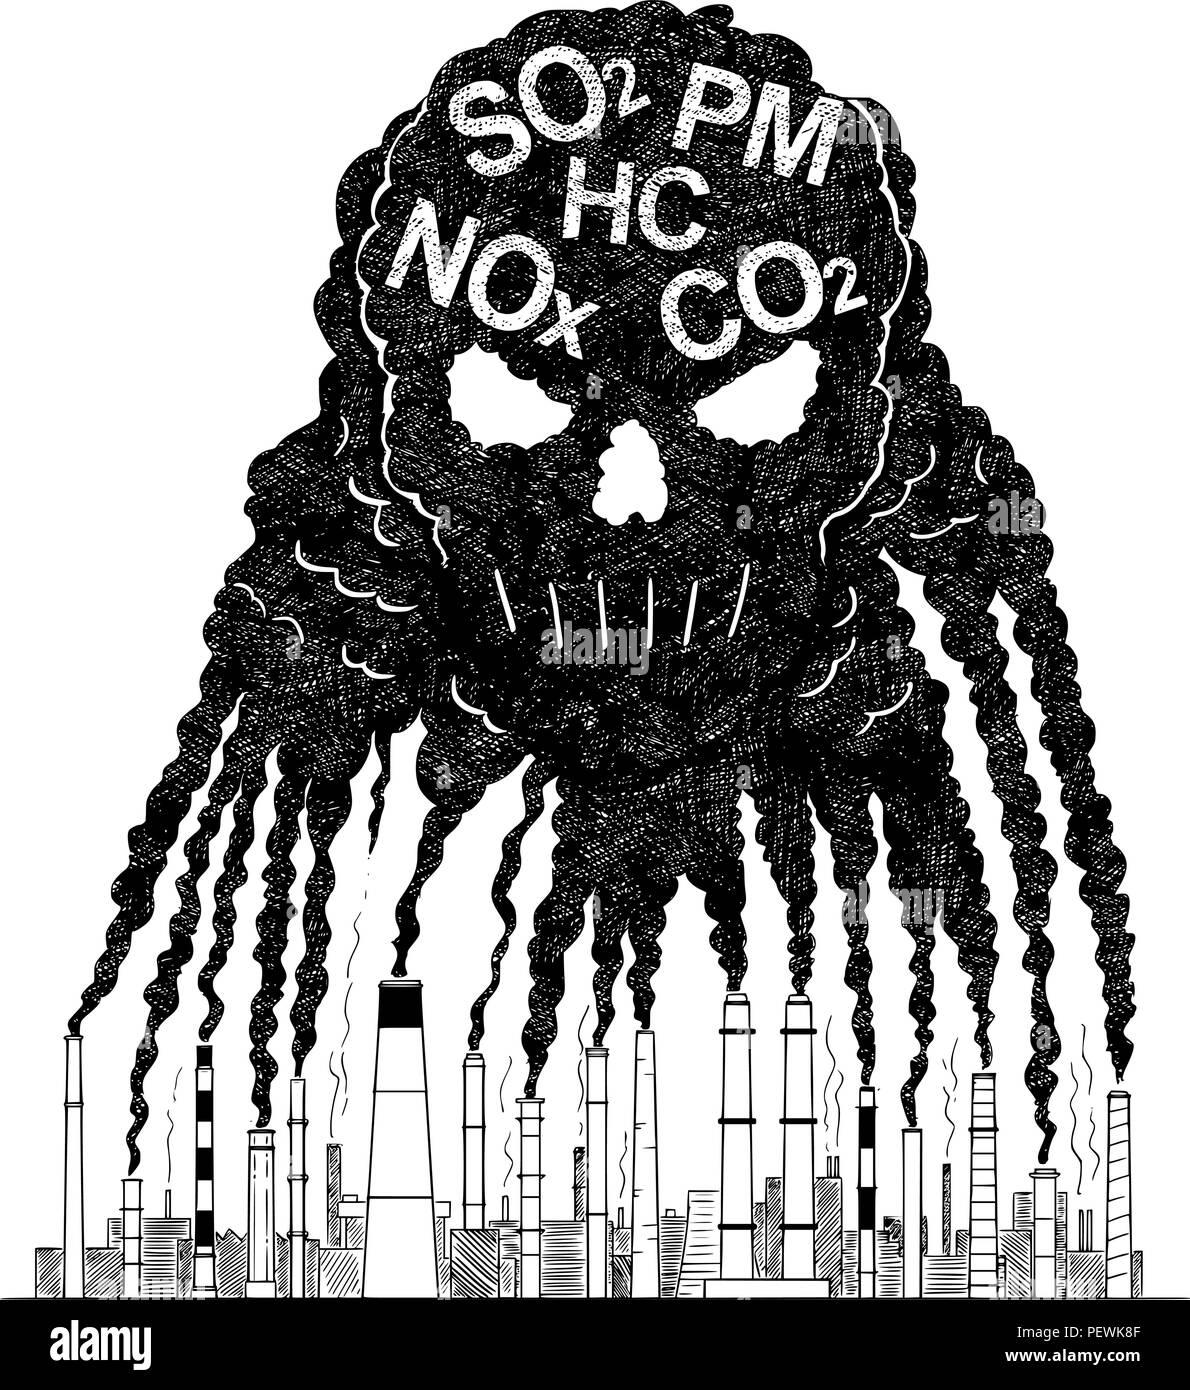 Vector artistic drawing illustration of smoke from smokestacks creating human skull concept of toxic air